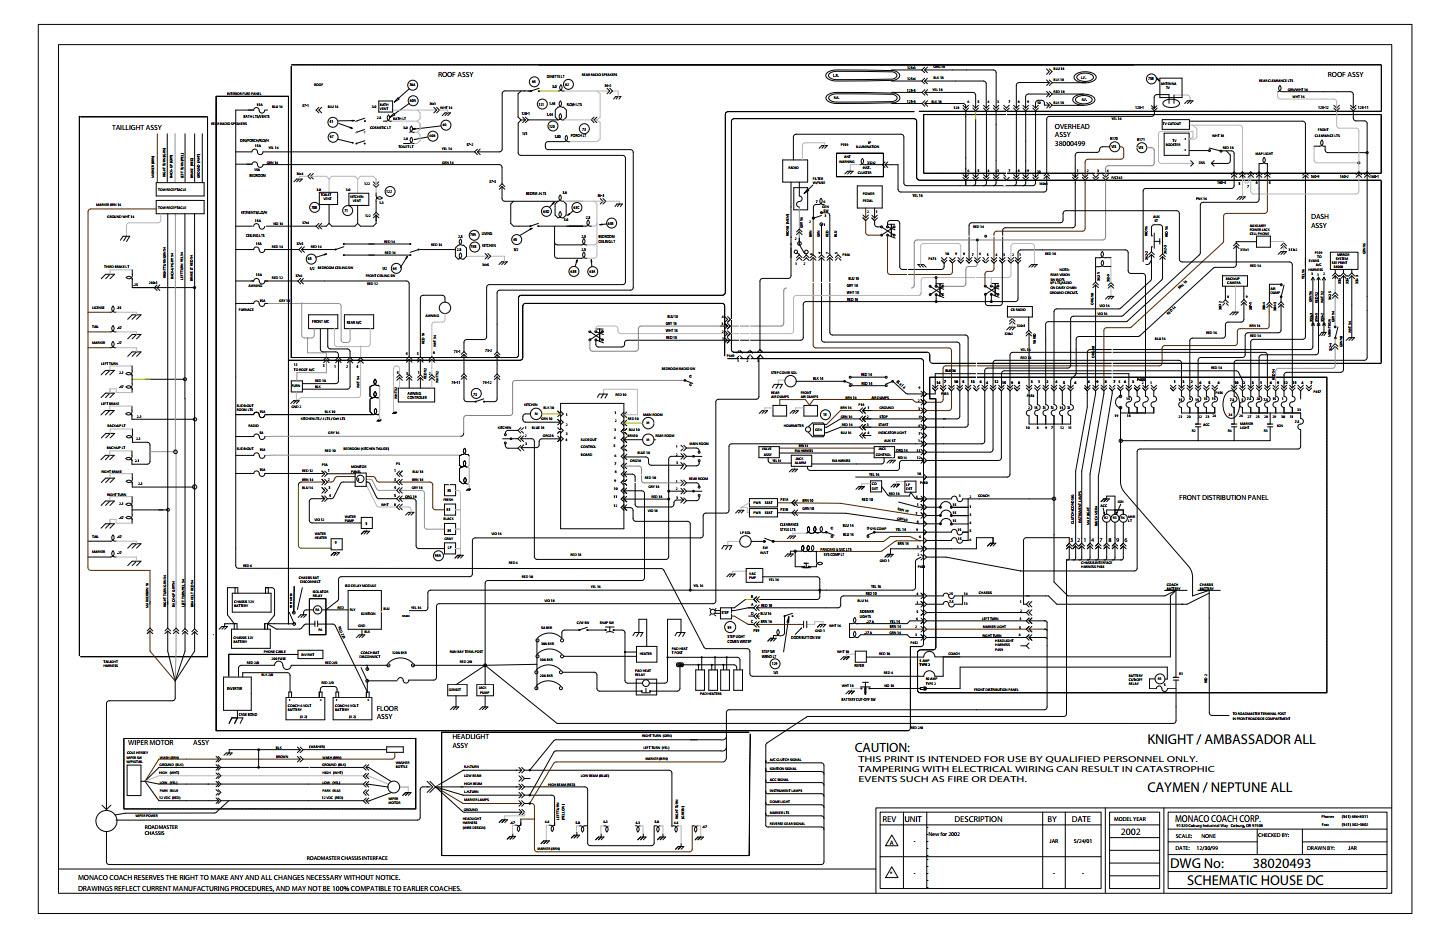 Rv Ke Wiring Diagram Schematic Free For You Typical Trailer Monaco Schematics Simple Schema Rh 6 Aspire Atlantis De Basic